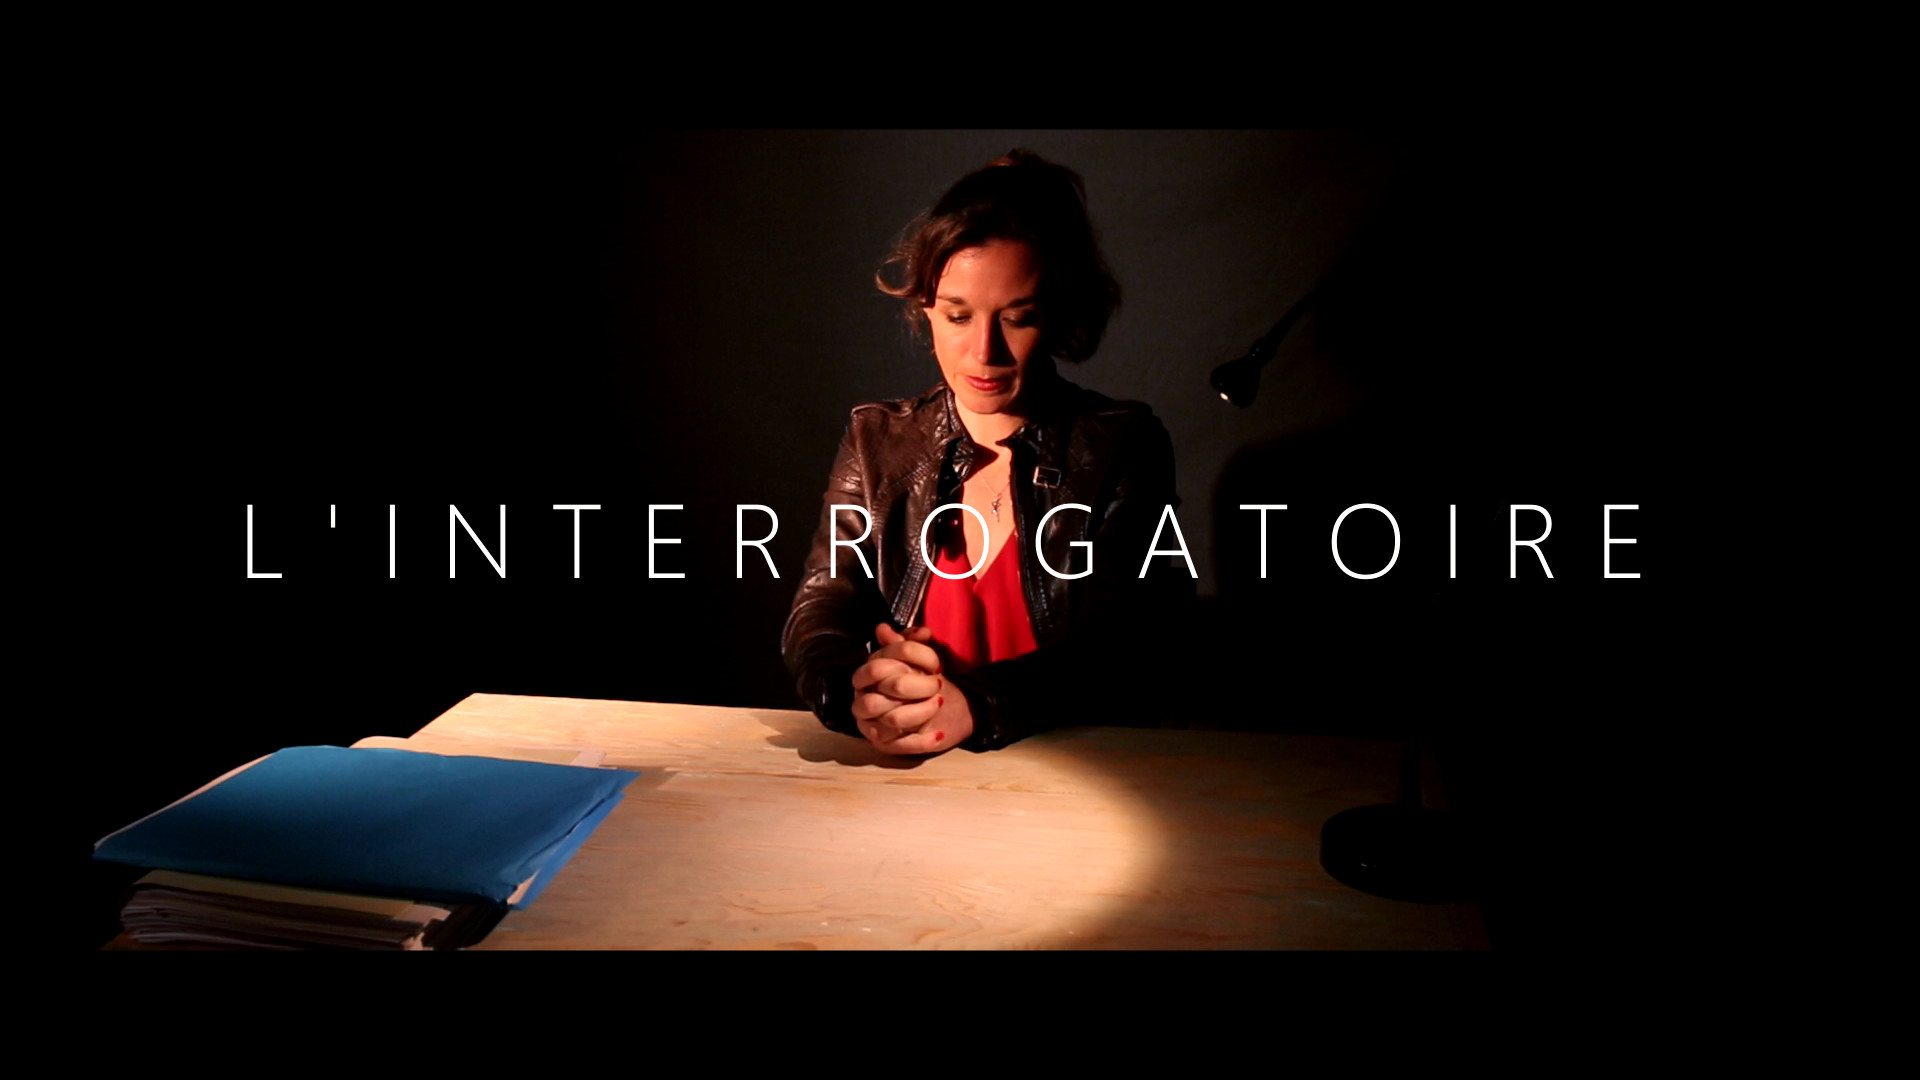 L'interrogatoire